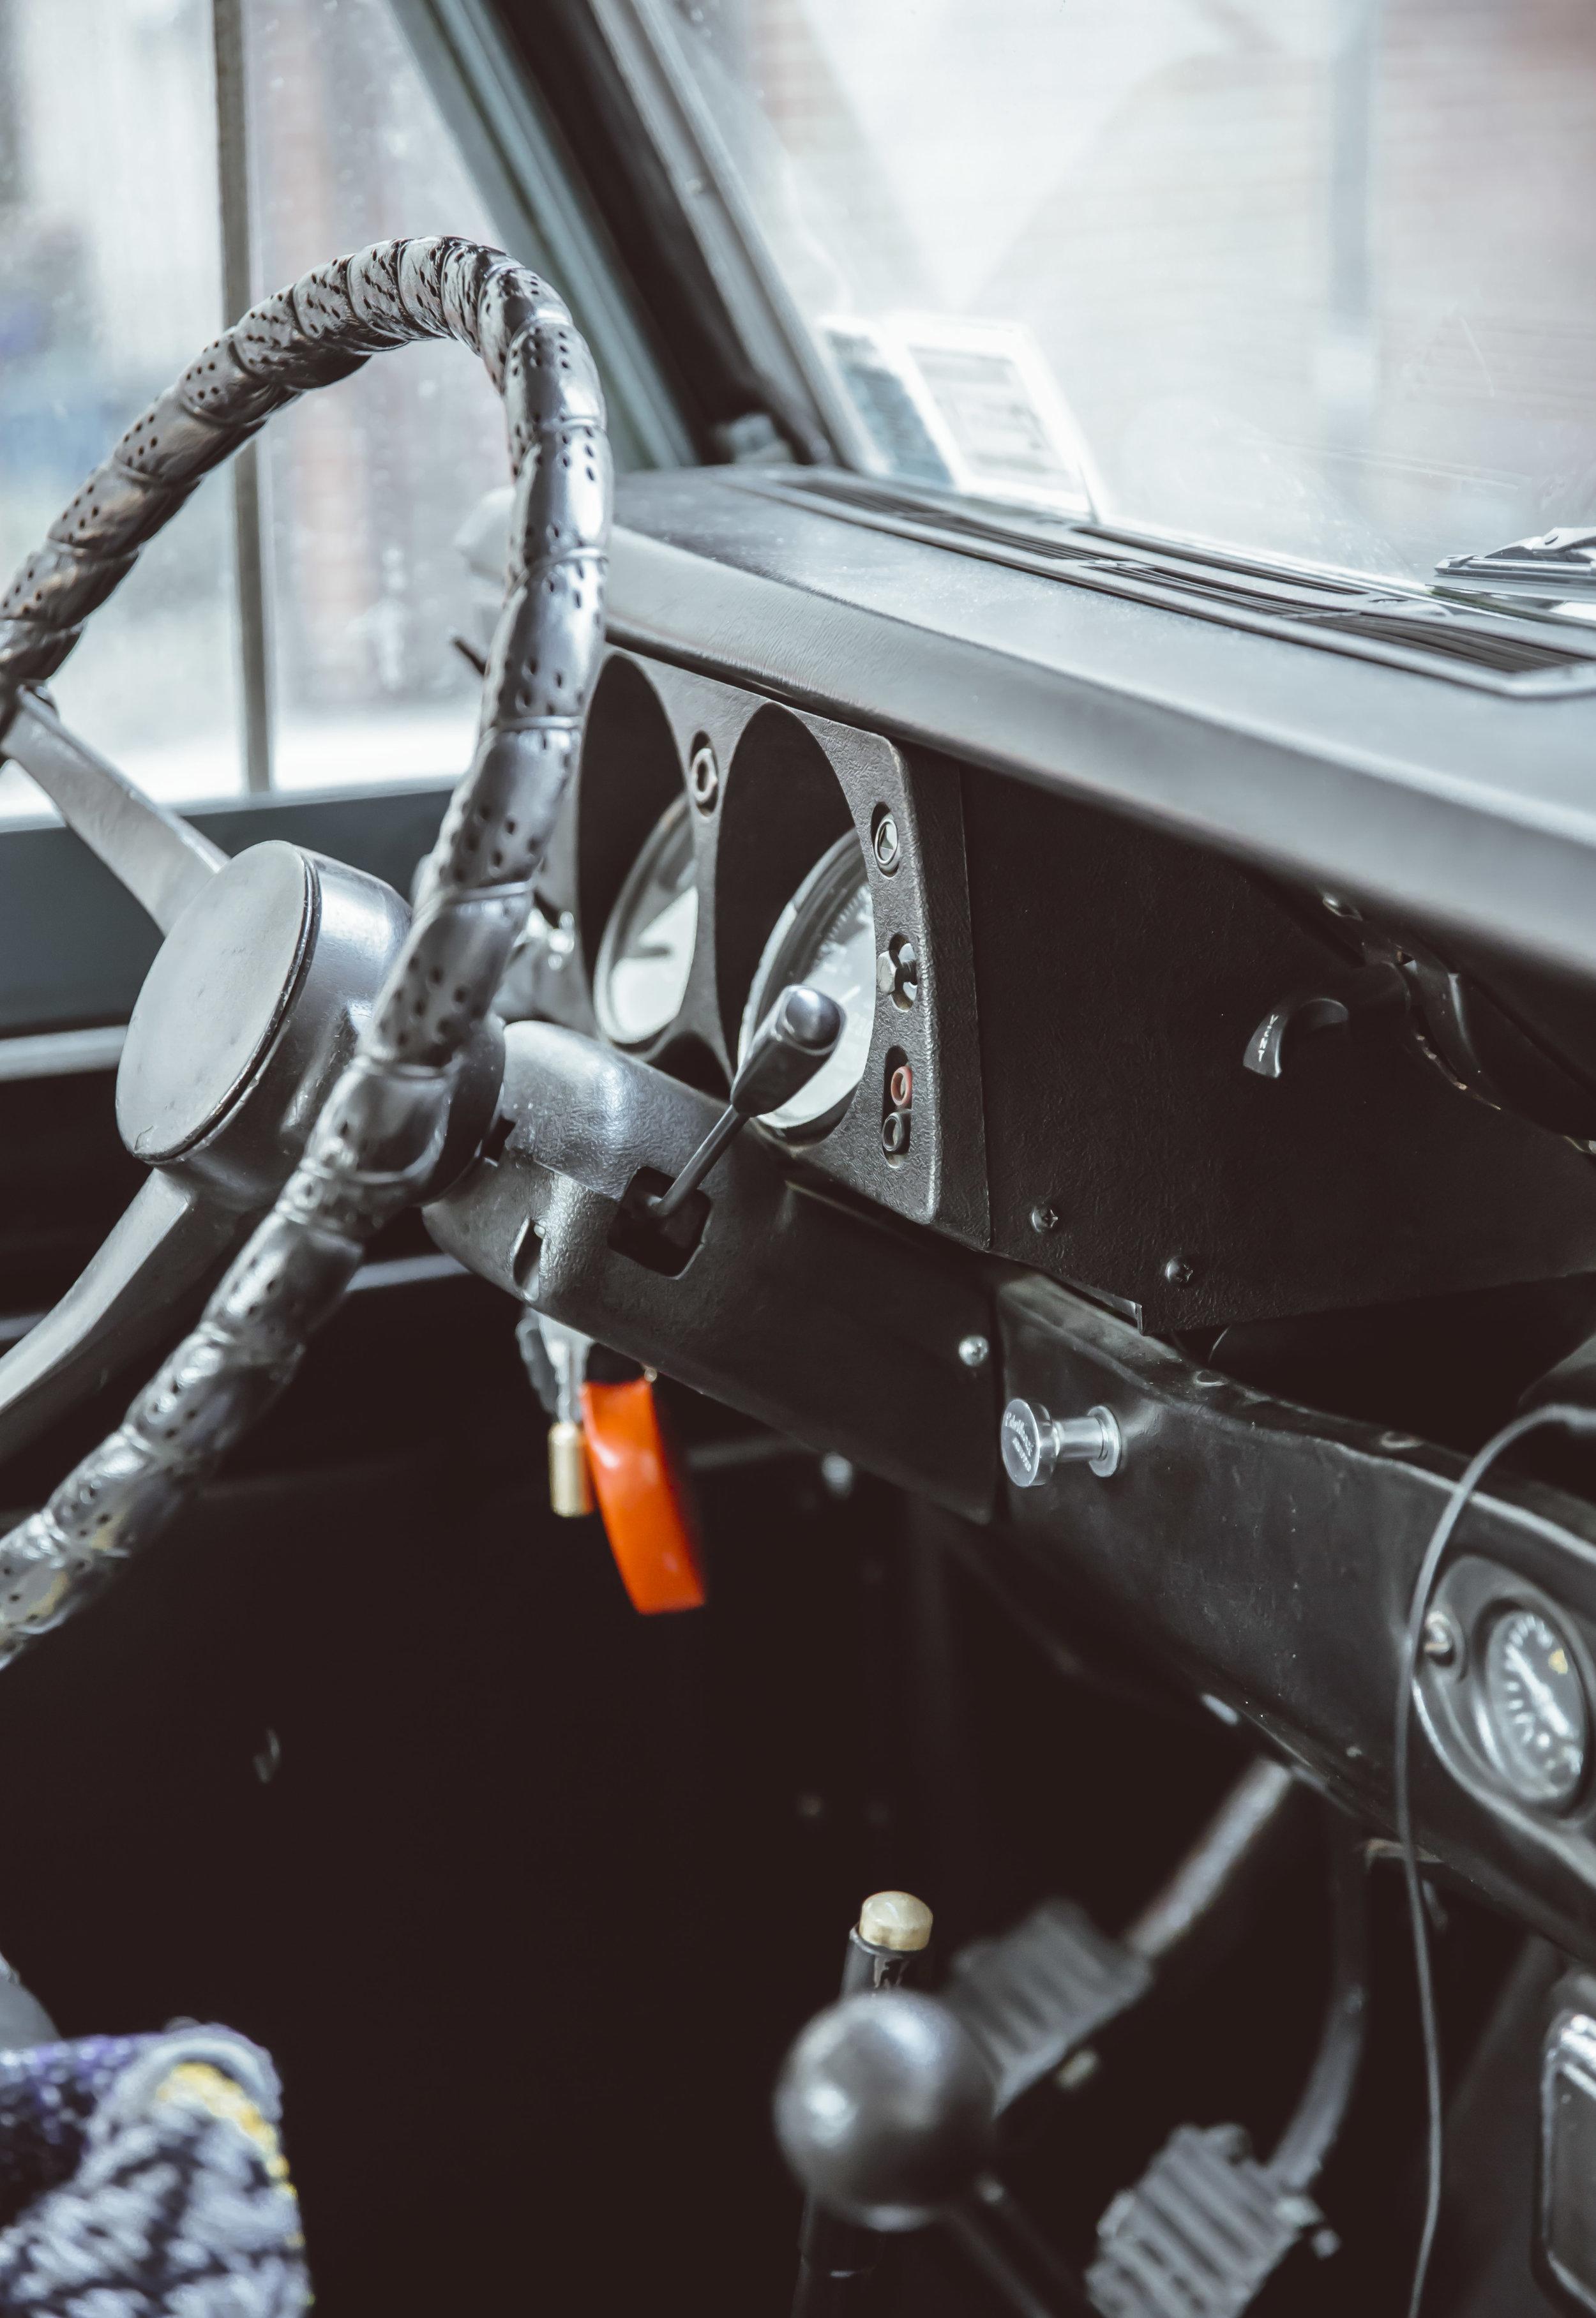 2xlarge_1972_Land_Rover_Series_III_04.jpg